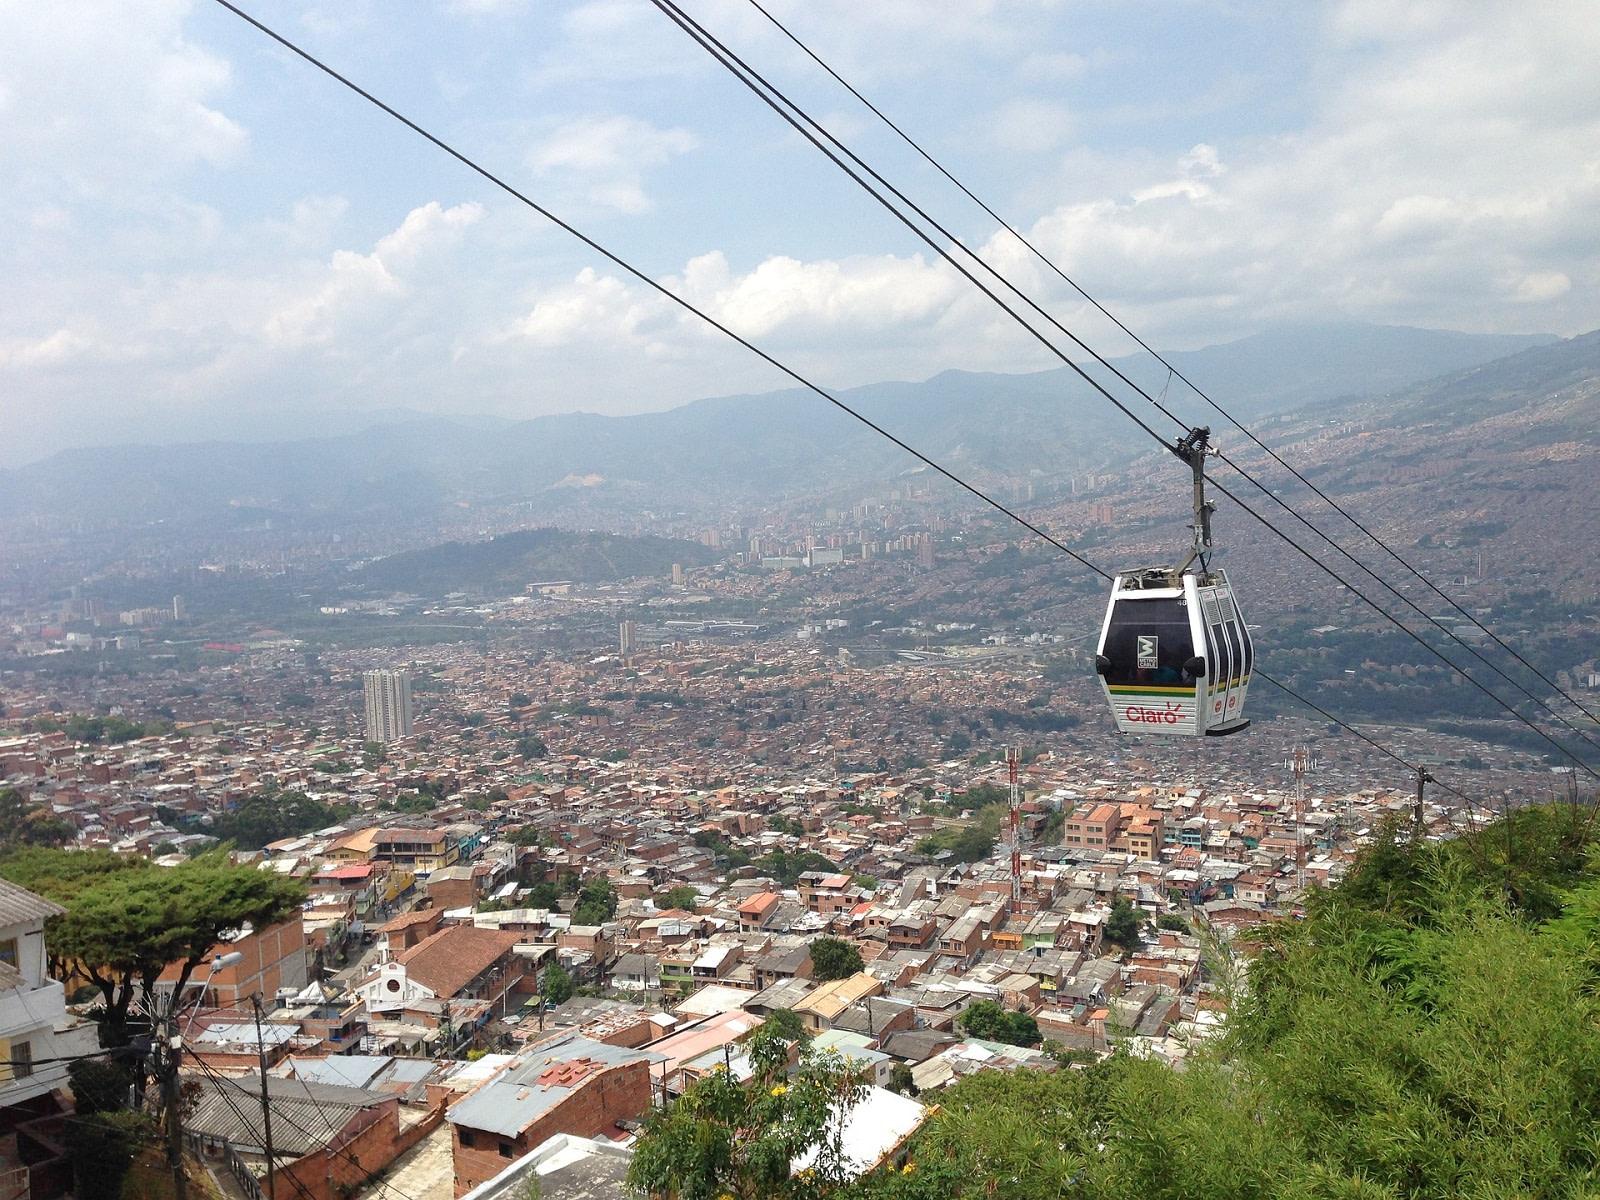 la paz bolivia telefèric